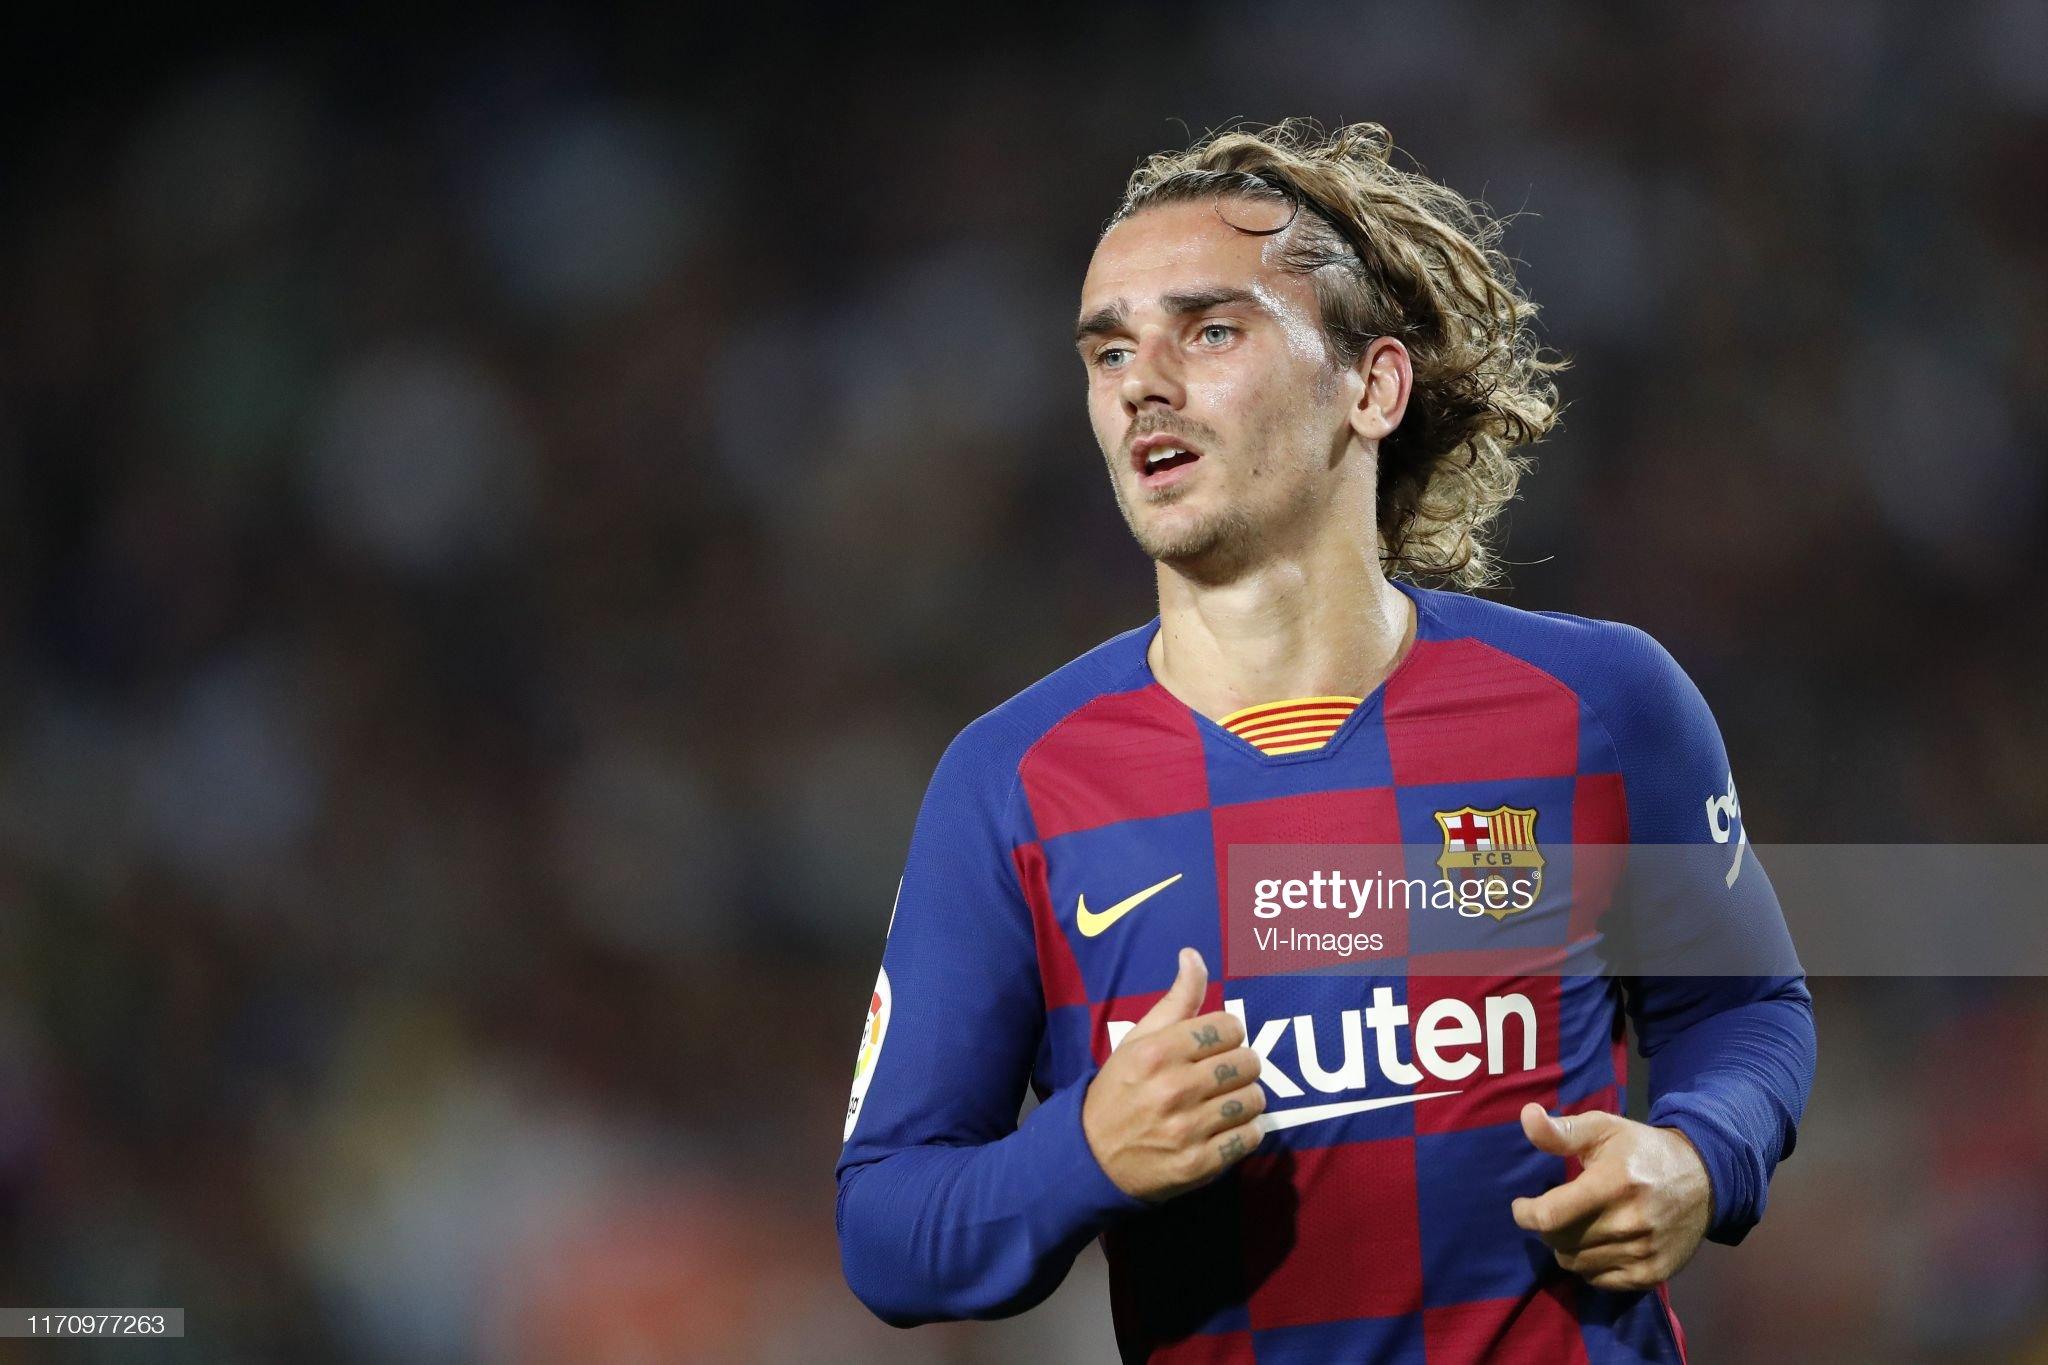 صور مباراة : برشلونة - فياريال 2-1 ( 24-09-2019 )  Antoine-griezmann-of-fc-barcelona-during-the-laliga-santander-match-picture-id1170977263?s=2048x2048